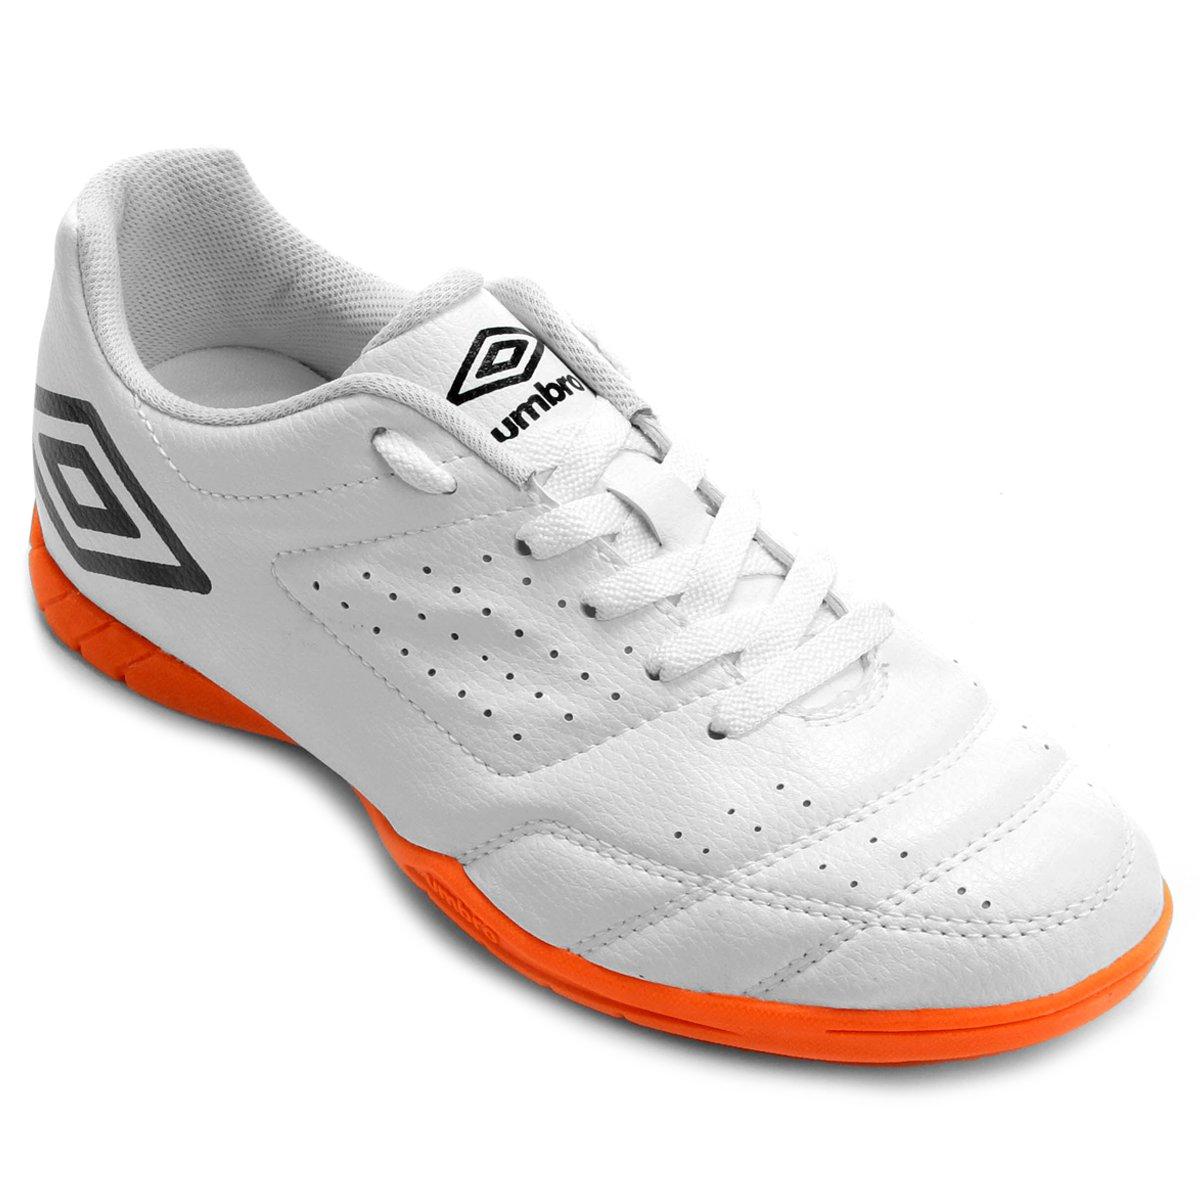 c13478ba26f2a Chuteira Umbro Sala Futsal - Compre Agora